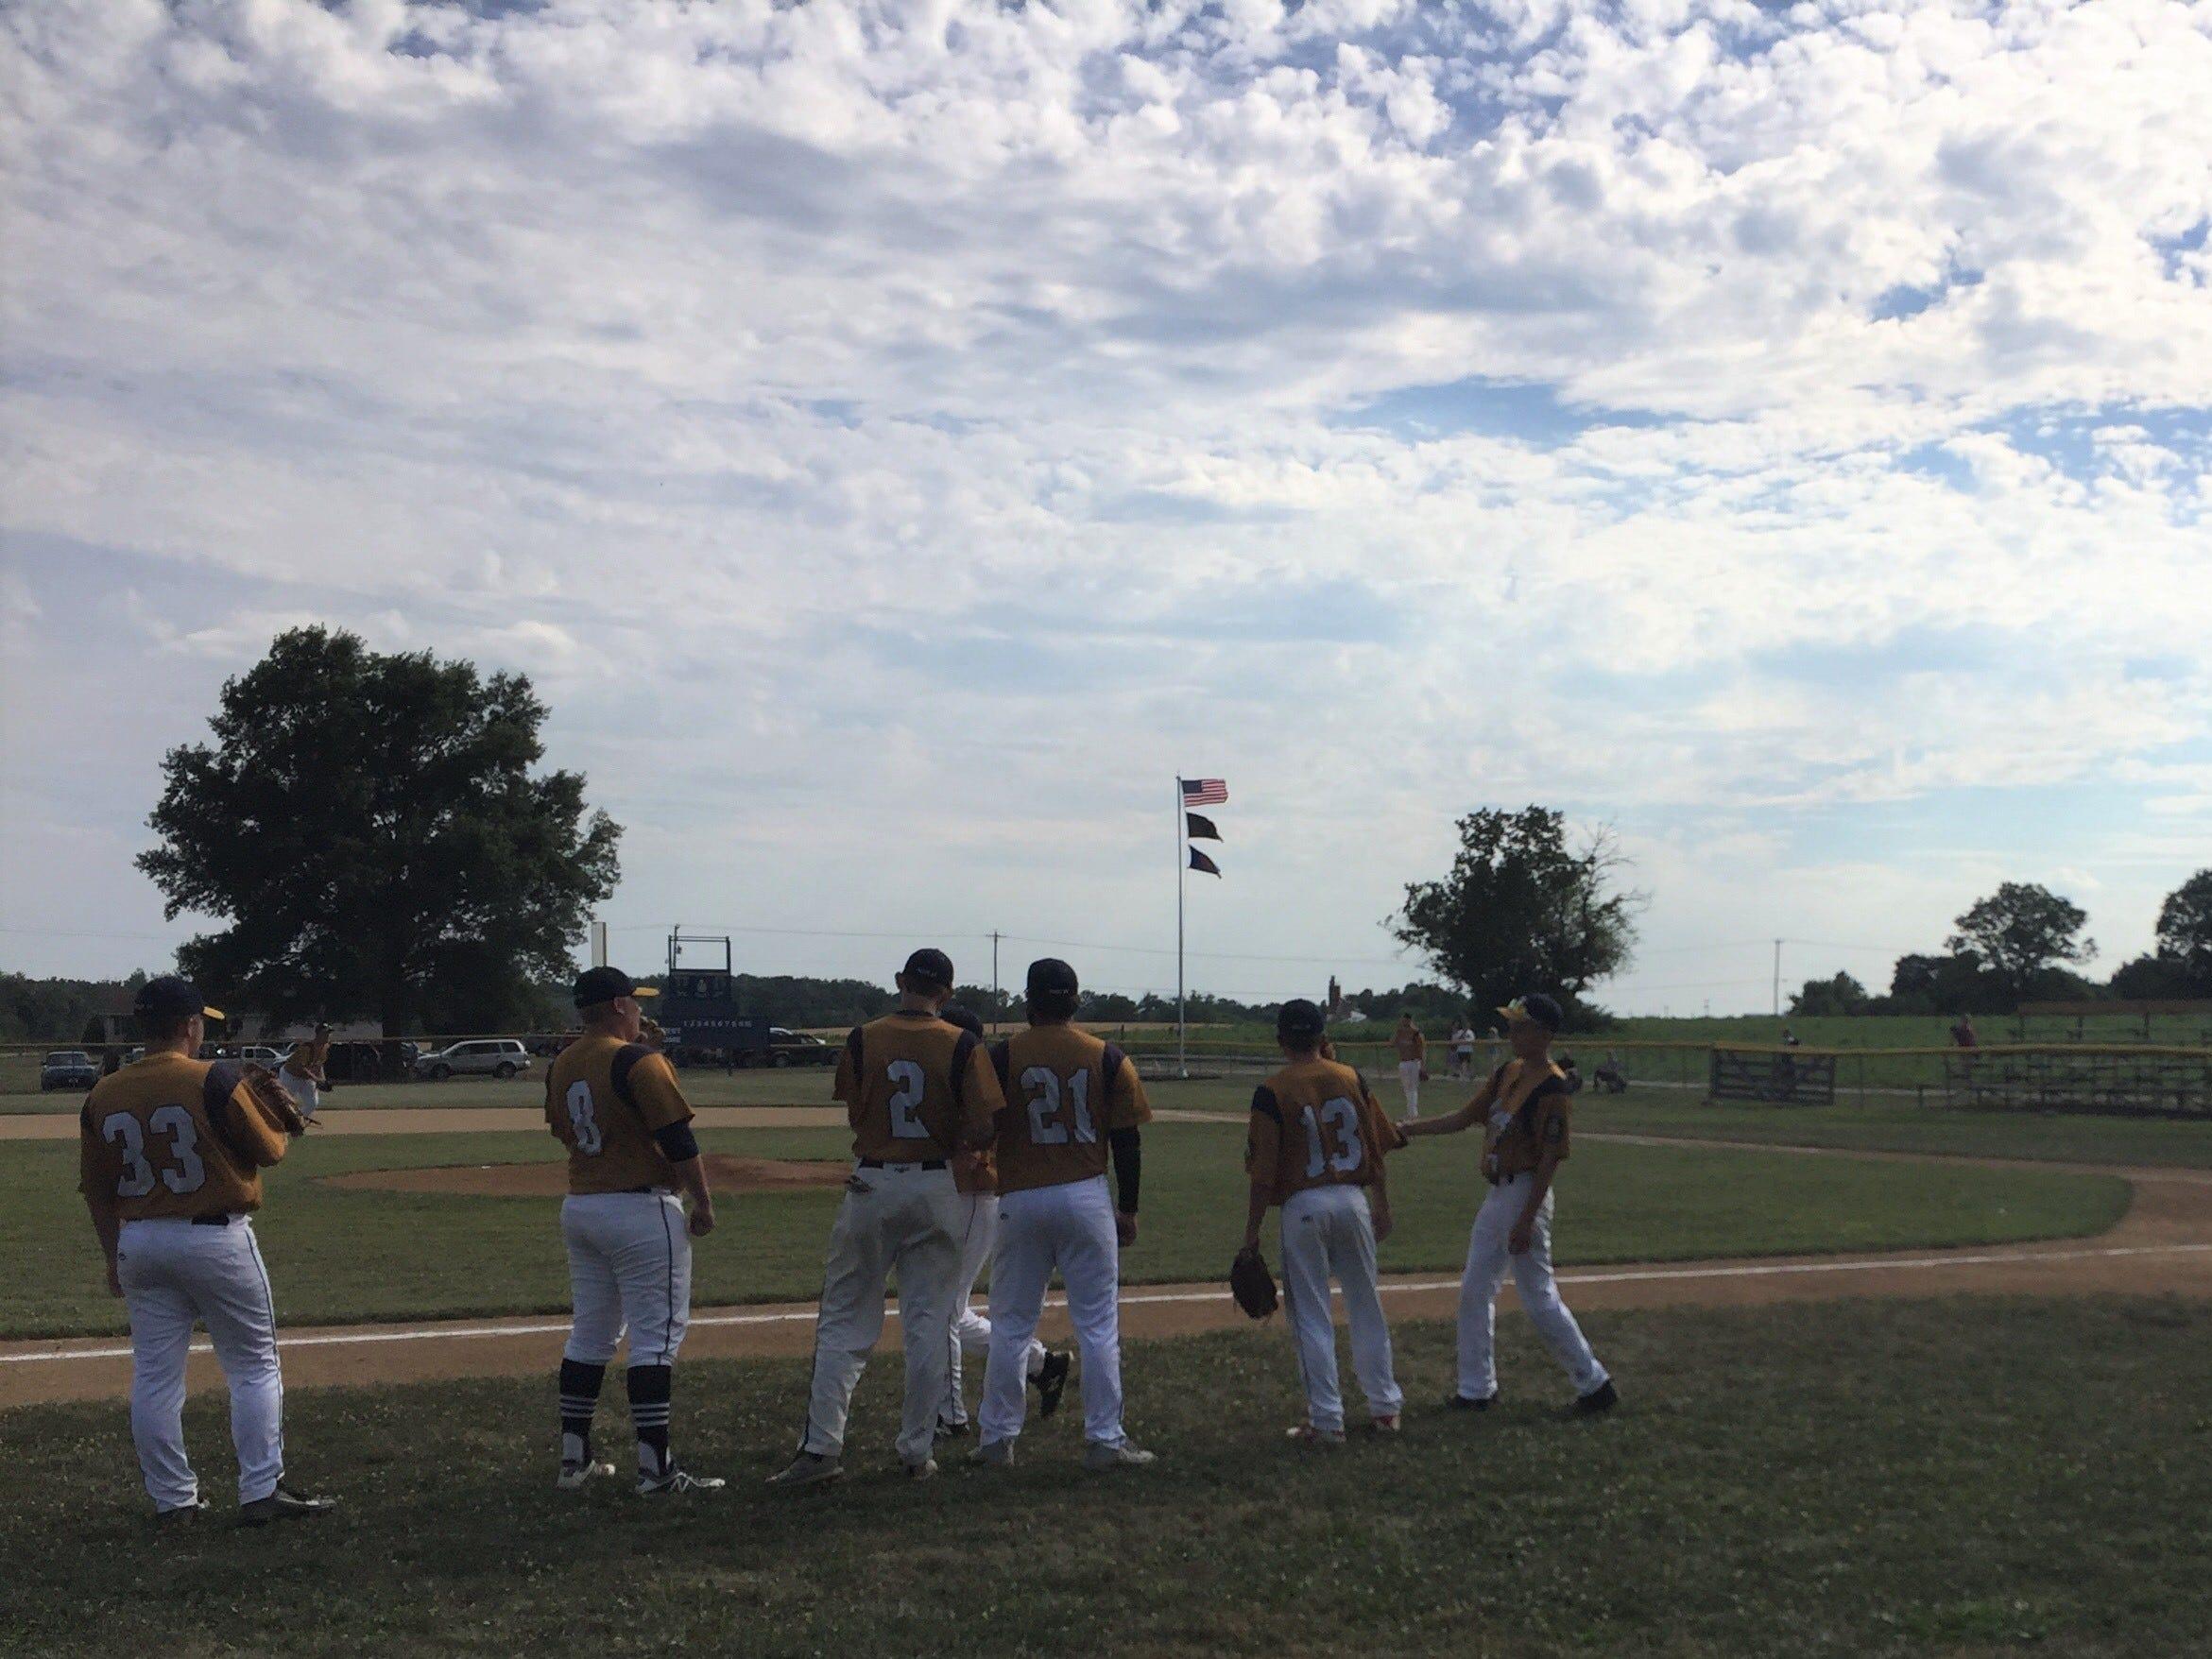 That hometown feeling: American Legion baseball still matters in Hanover